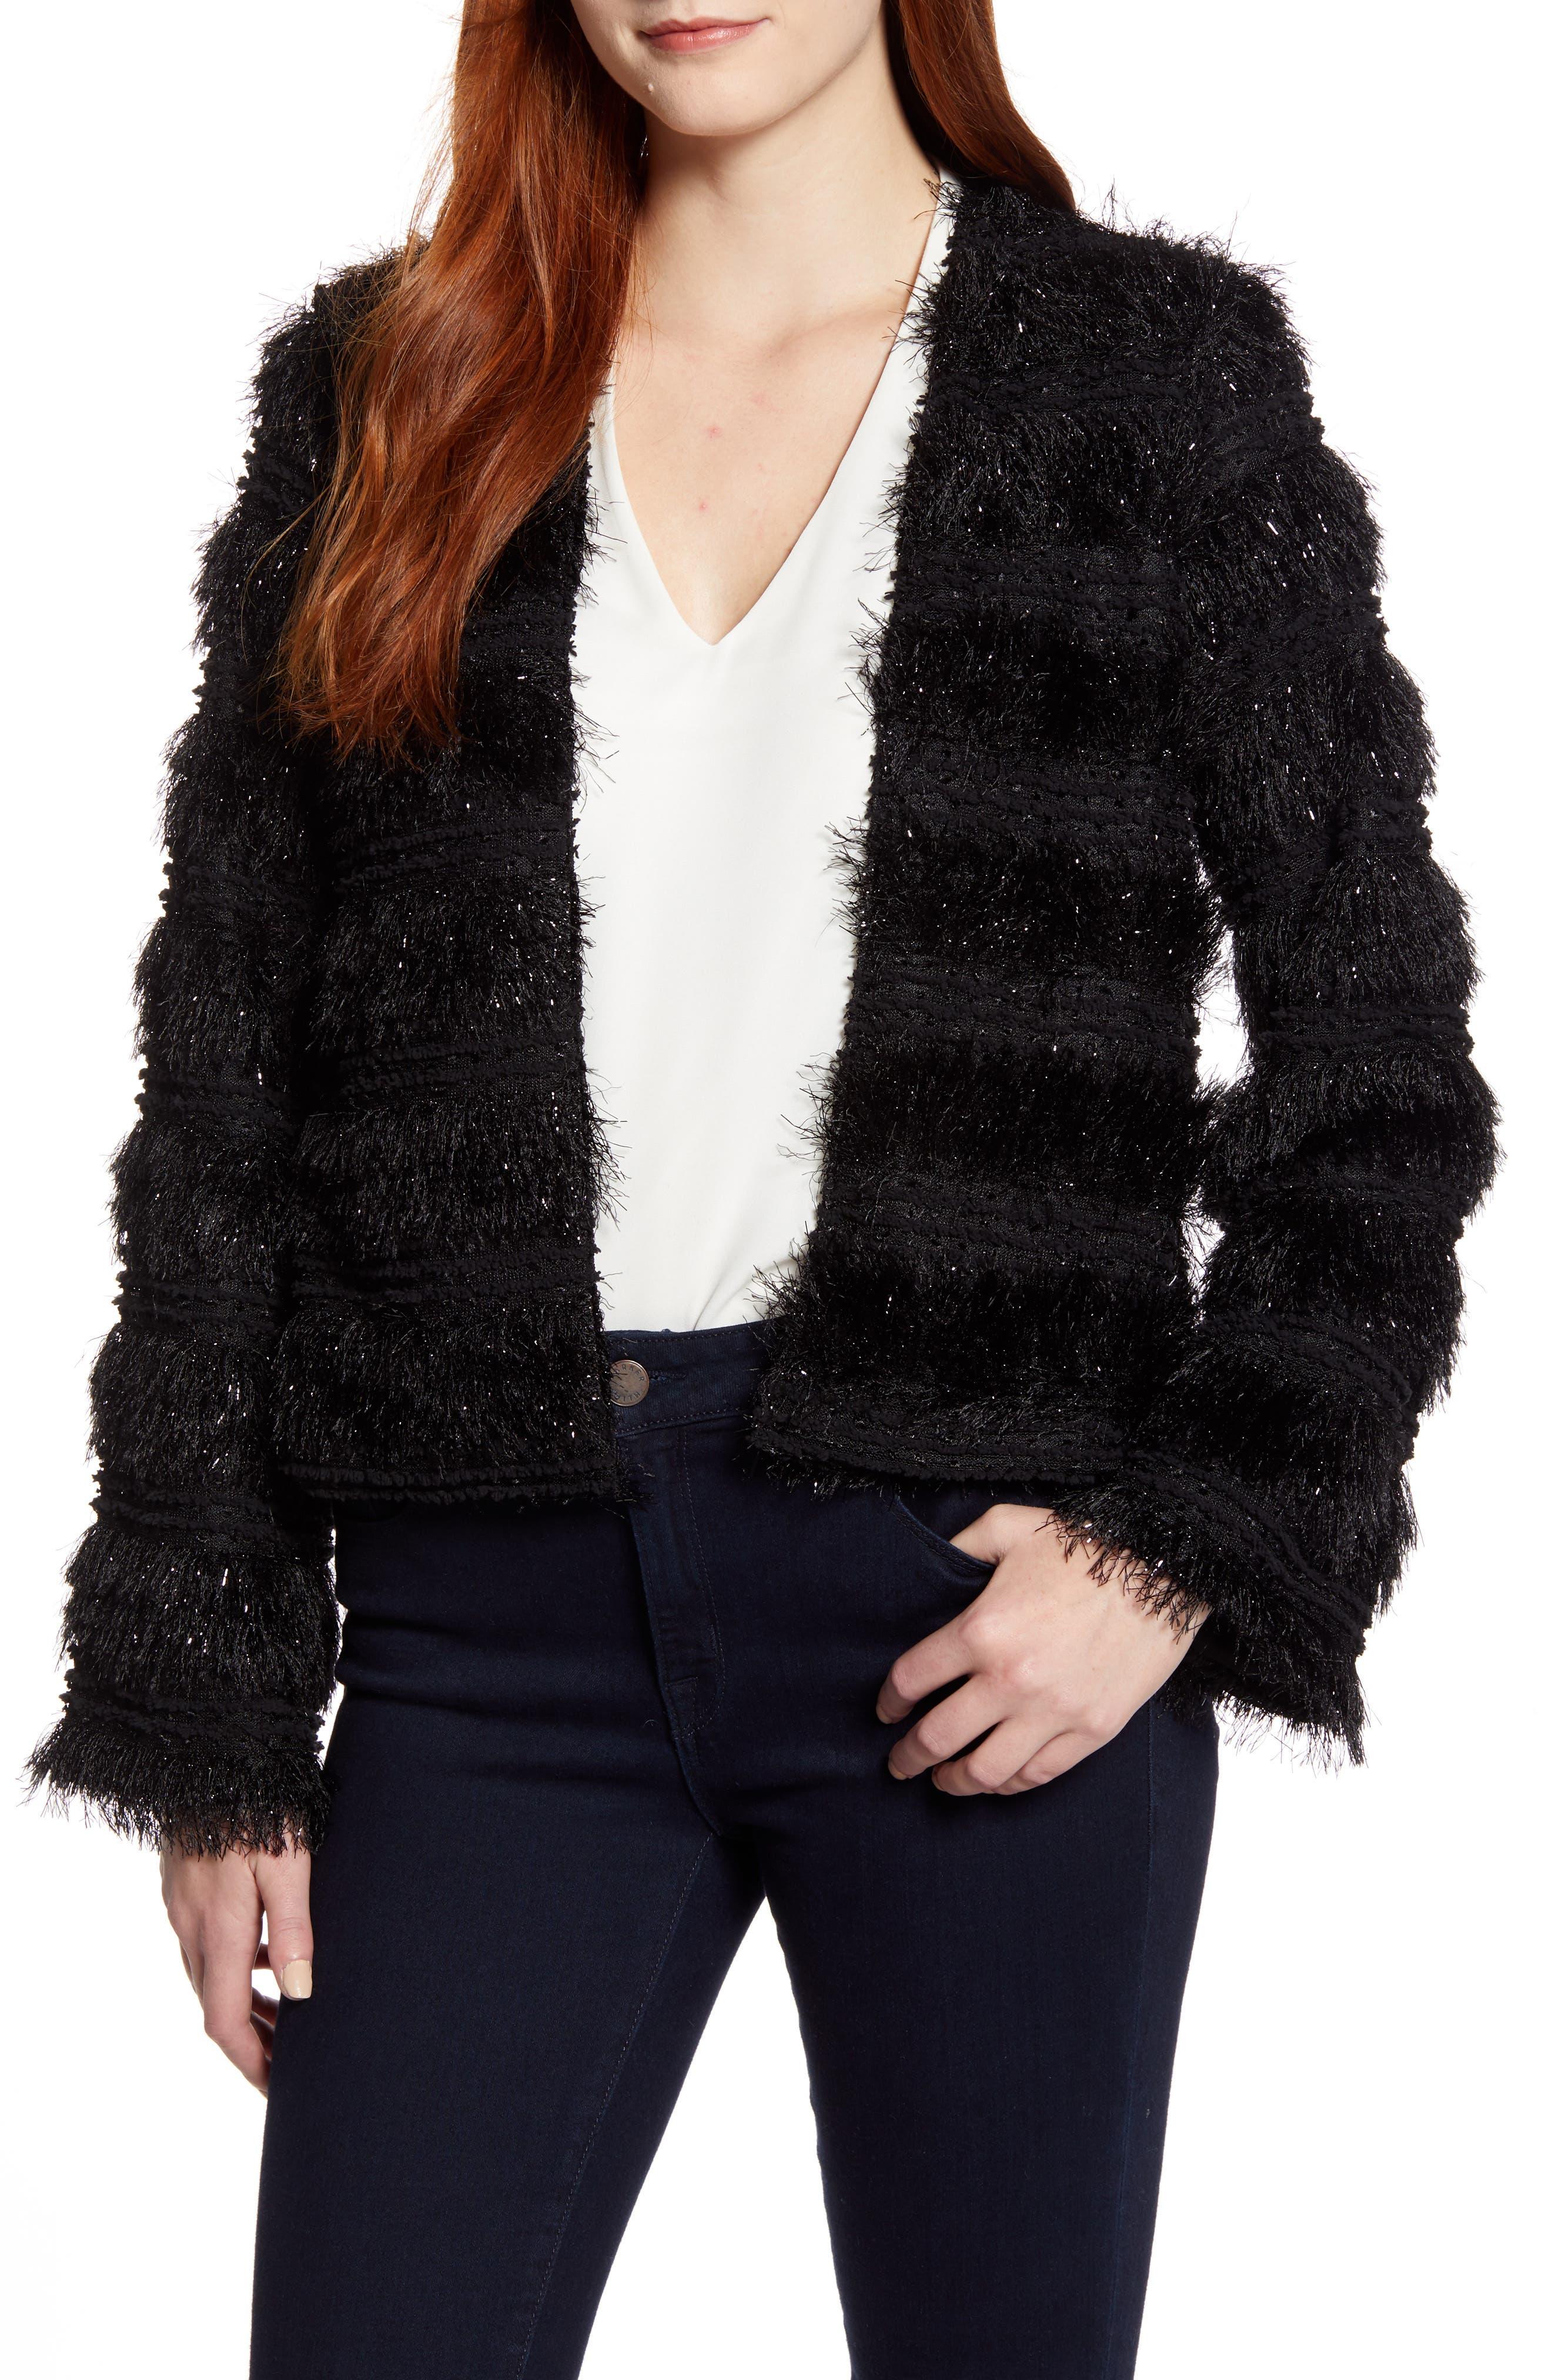 Gibson x Glam Jessica Fay Shimmer Fringe Party Cardigan (Regular & Petite)